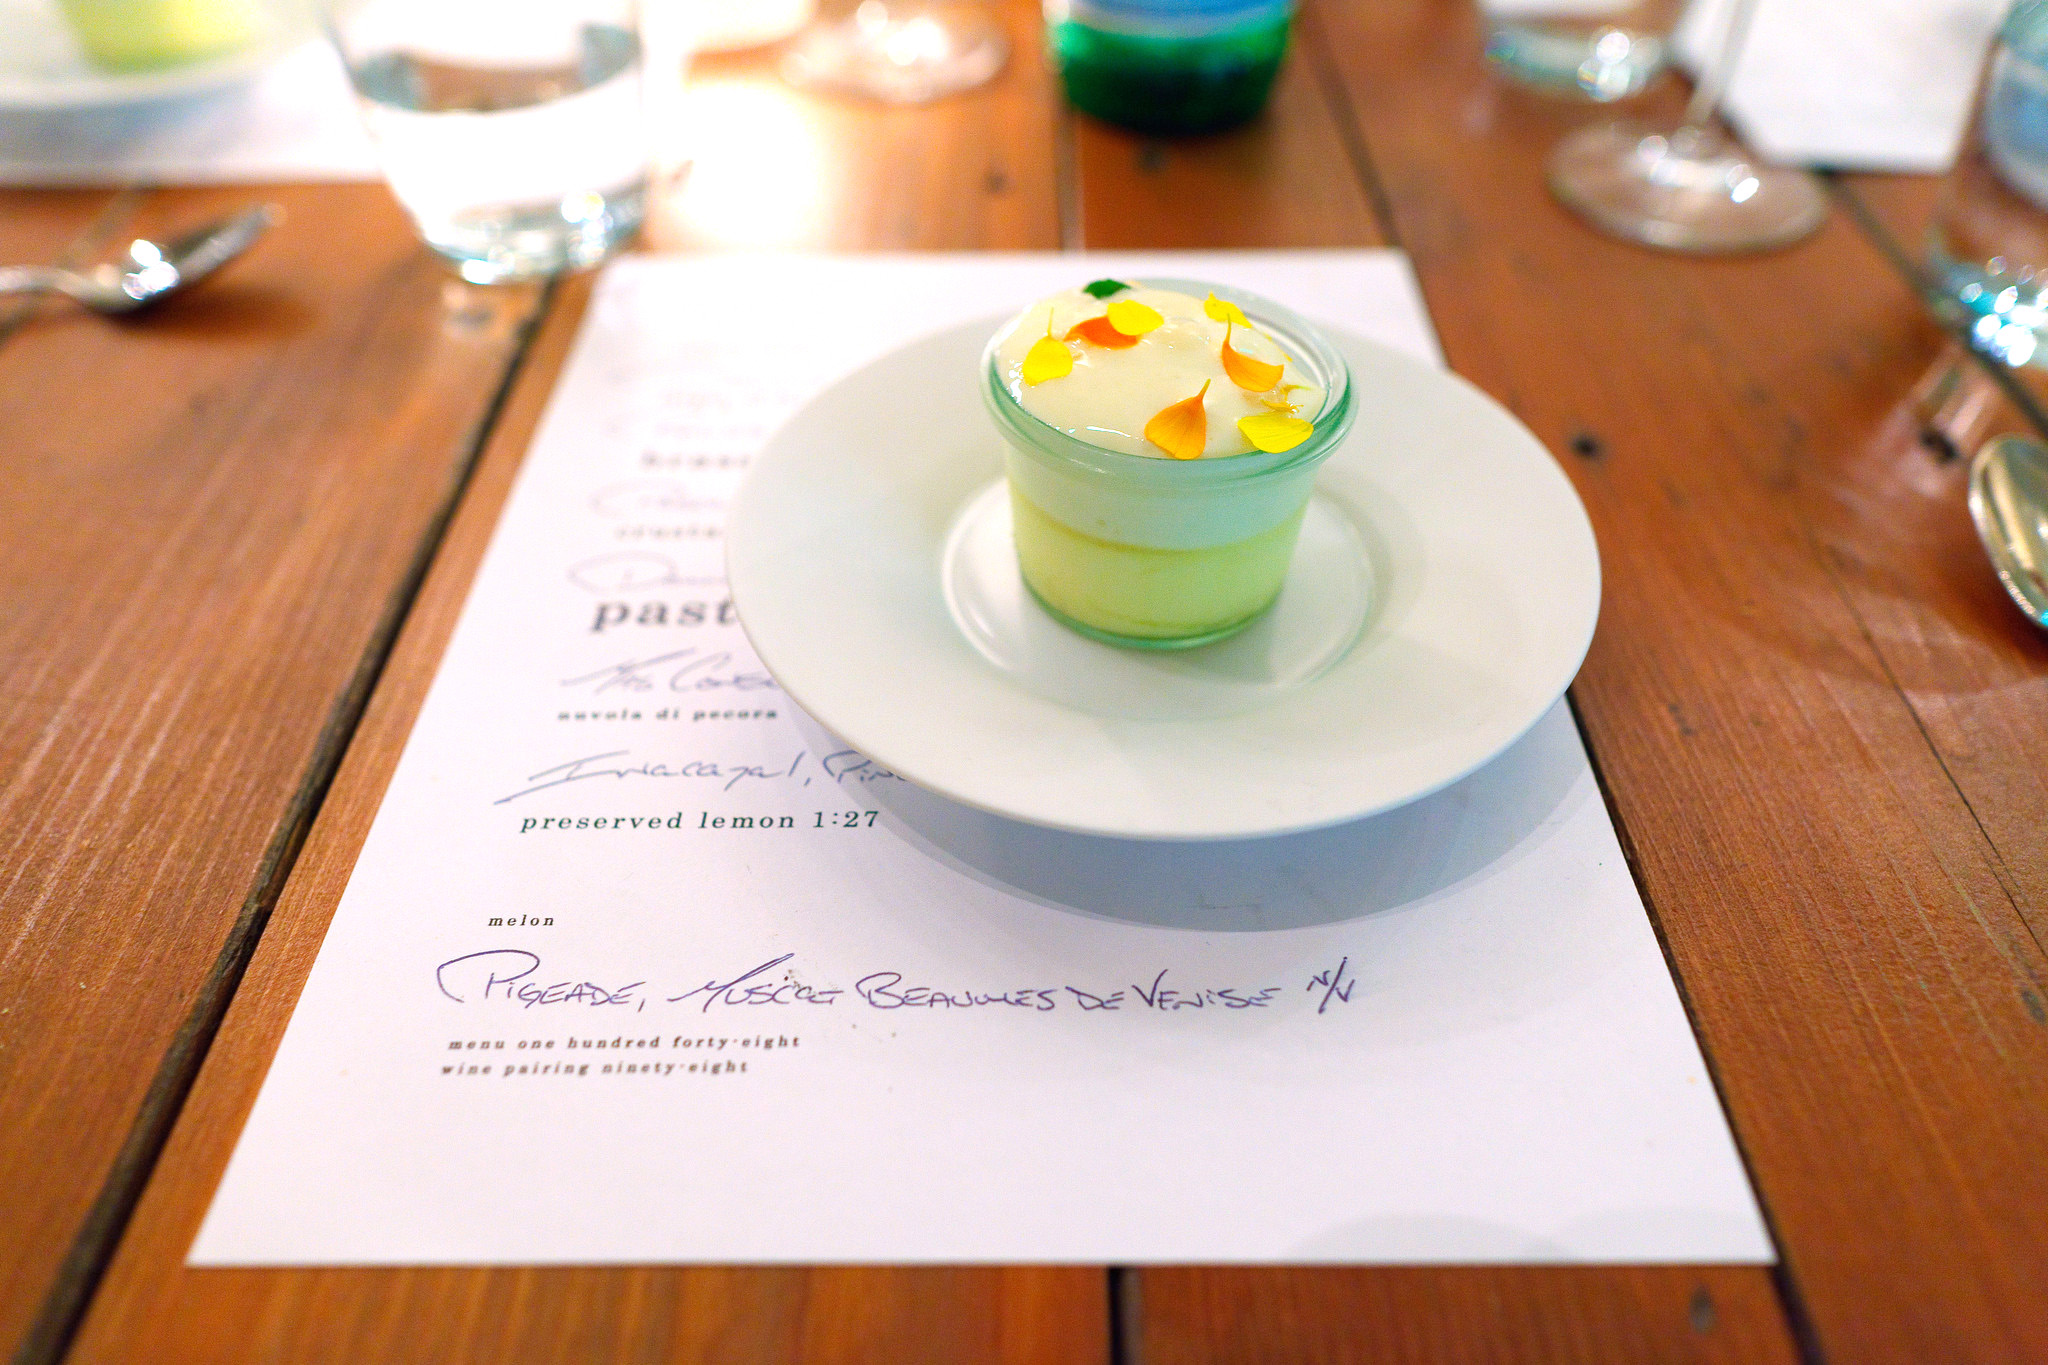 7th Course, Preserved lemon - lemon preserved on Jan 27, 2011. Candied lemon, perserved lemon cream, lemon sorbet, chrysanthemum petals